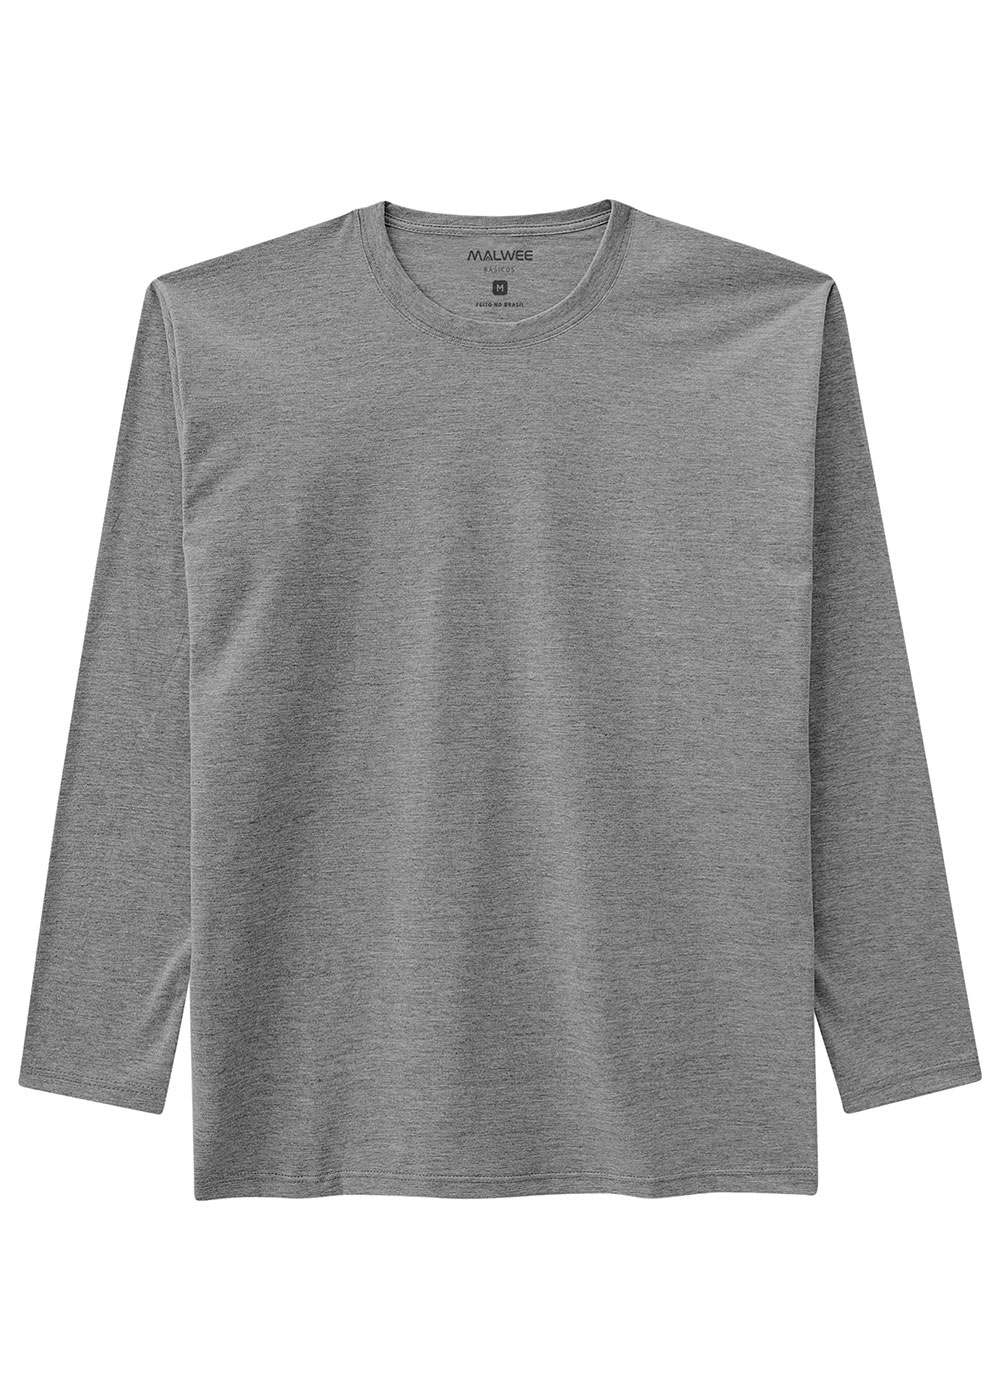 Camiseta Masculina ADULTO Inverno Cinza Malwee